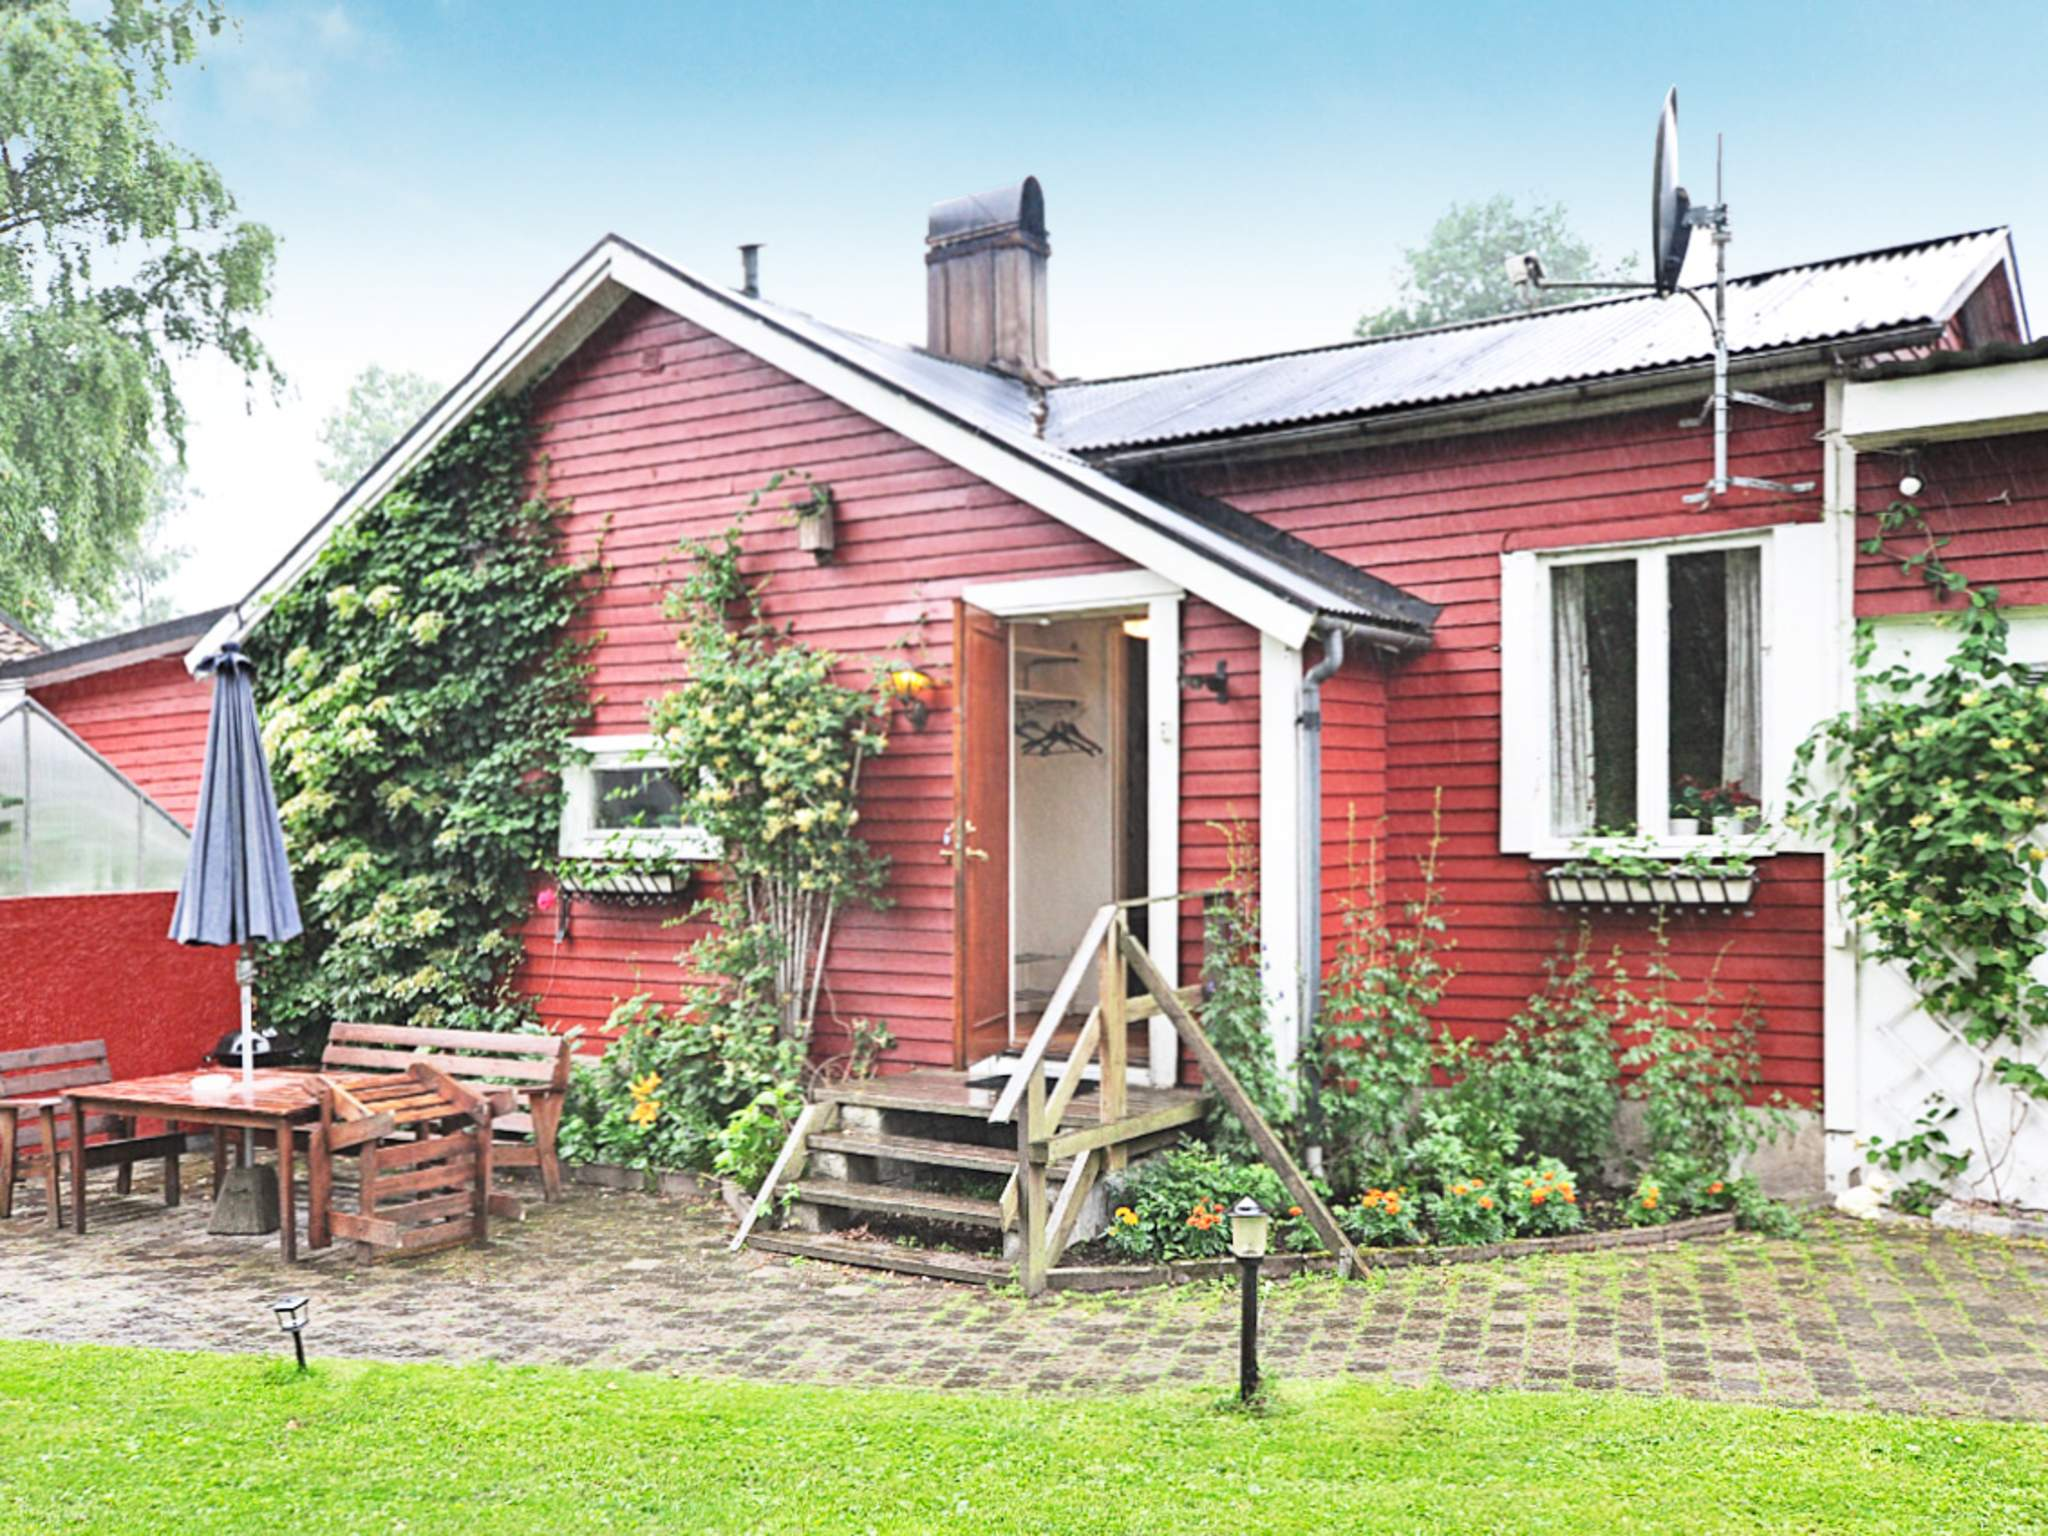 Ferienhaus Finjasjön (86936), Hässleholm, Skane län, Südschweden, Schweden, Bild 1